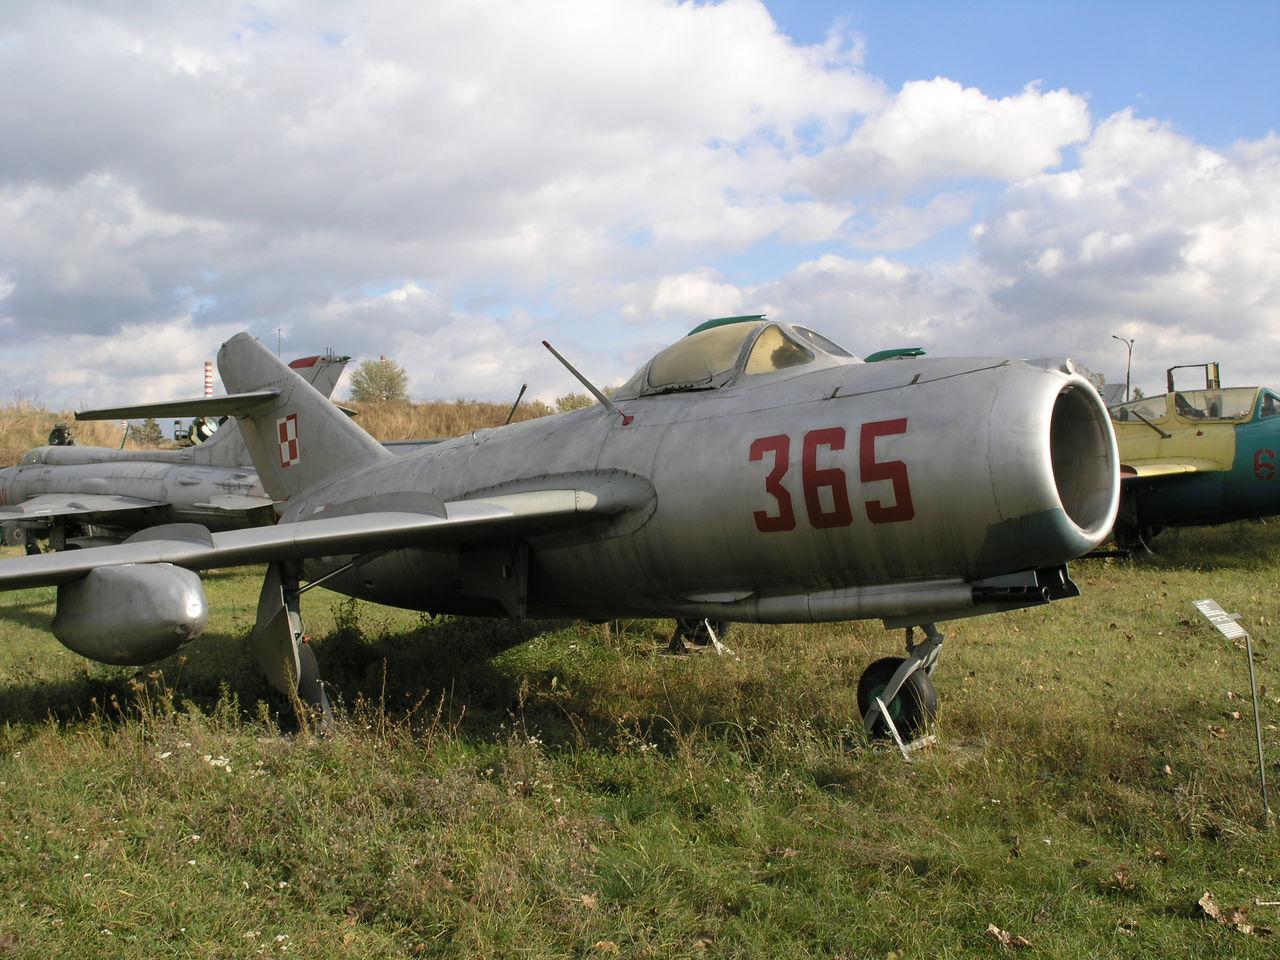 365 Air Vehicle Airplane Cold War Military Military Aircraft Military Airplane Number Numbers Plane Russian